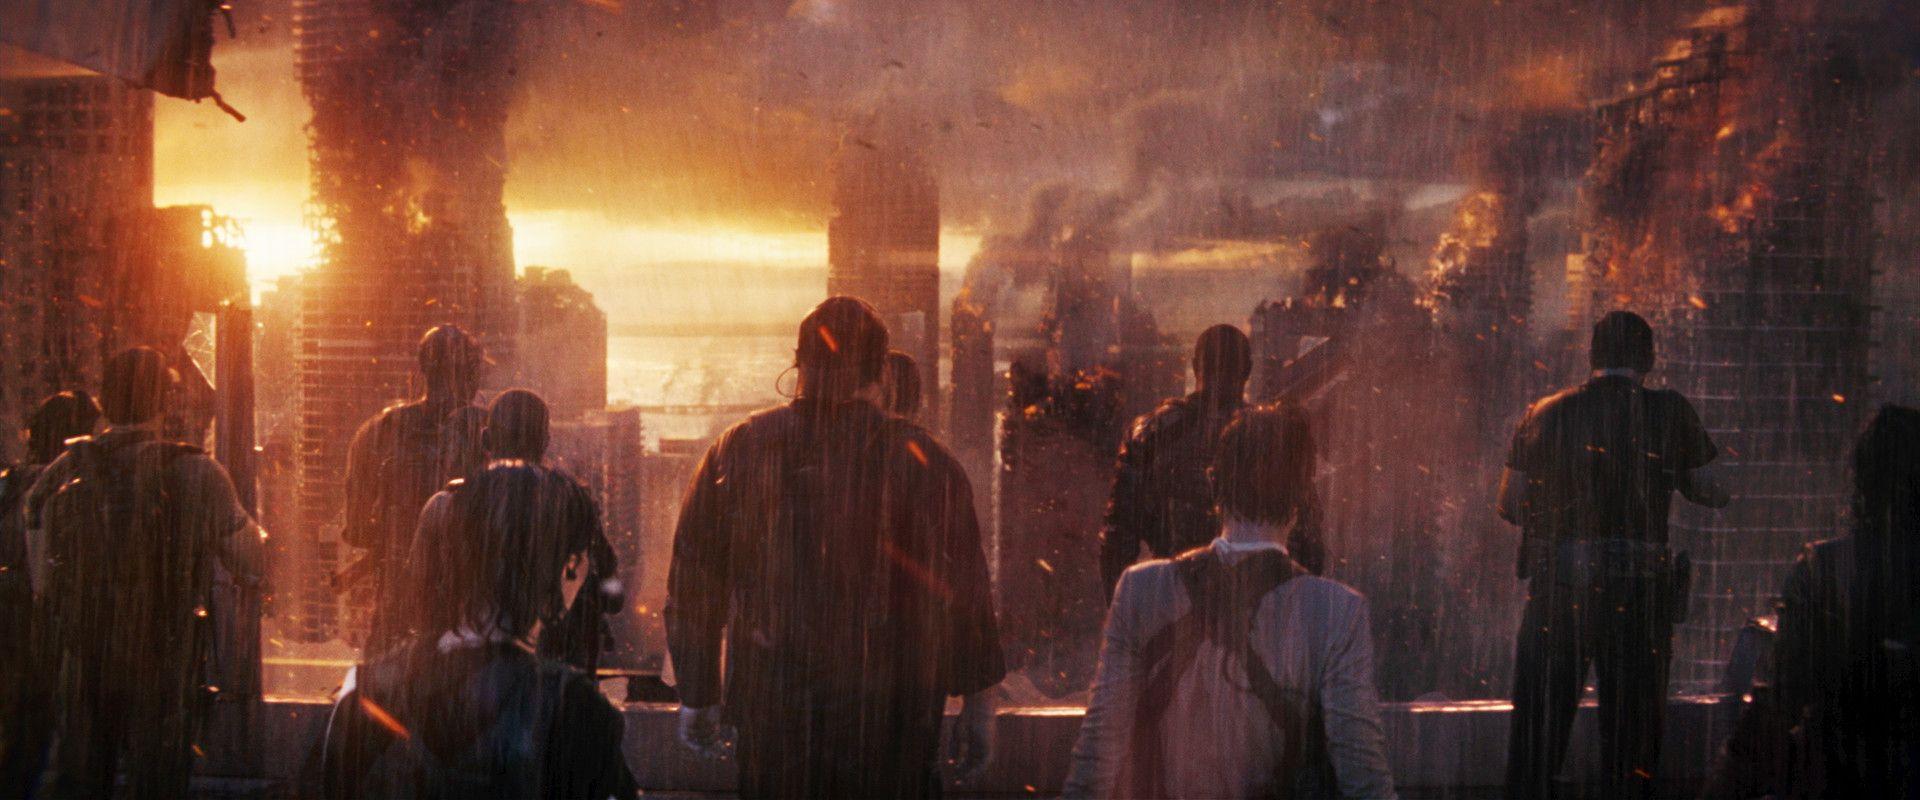 The Tomorrow War Trailer Reveals Chris Pratt Time-Traveling Sci-Fi Film